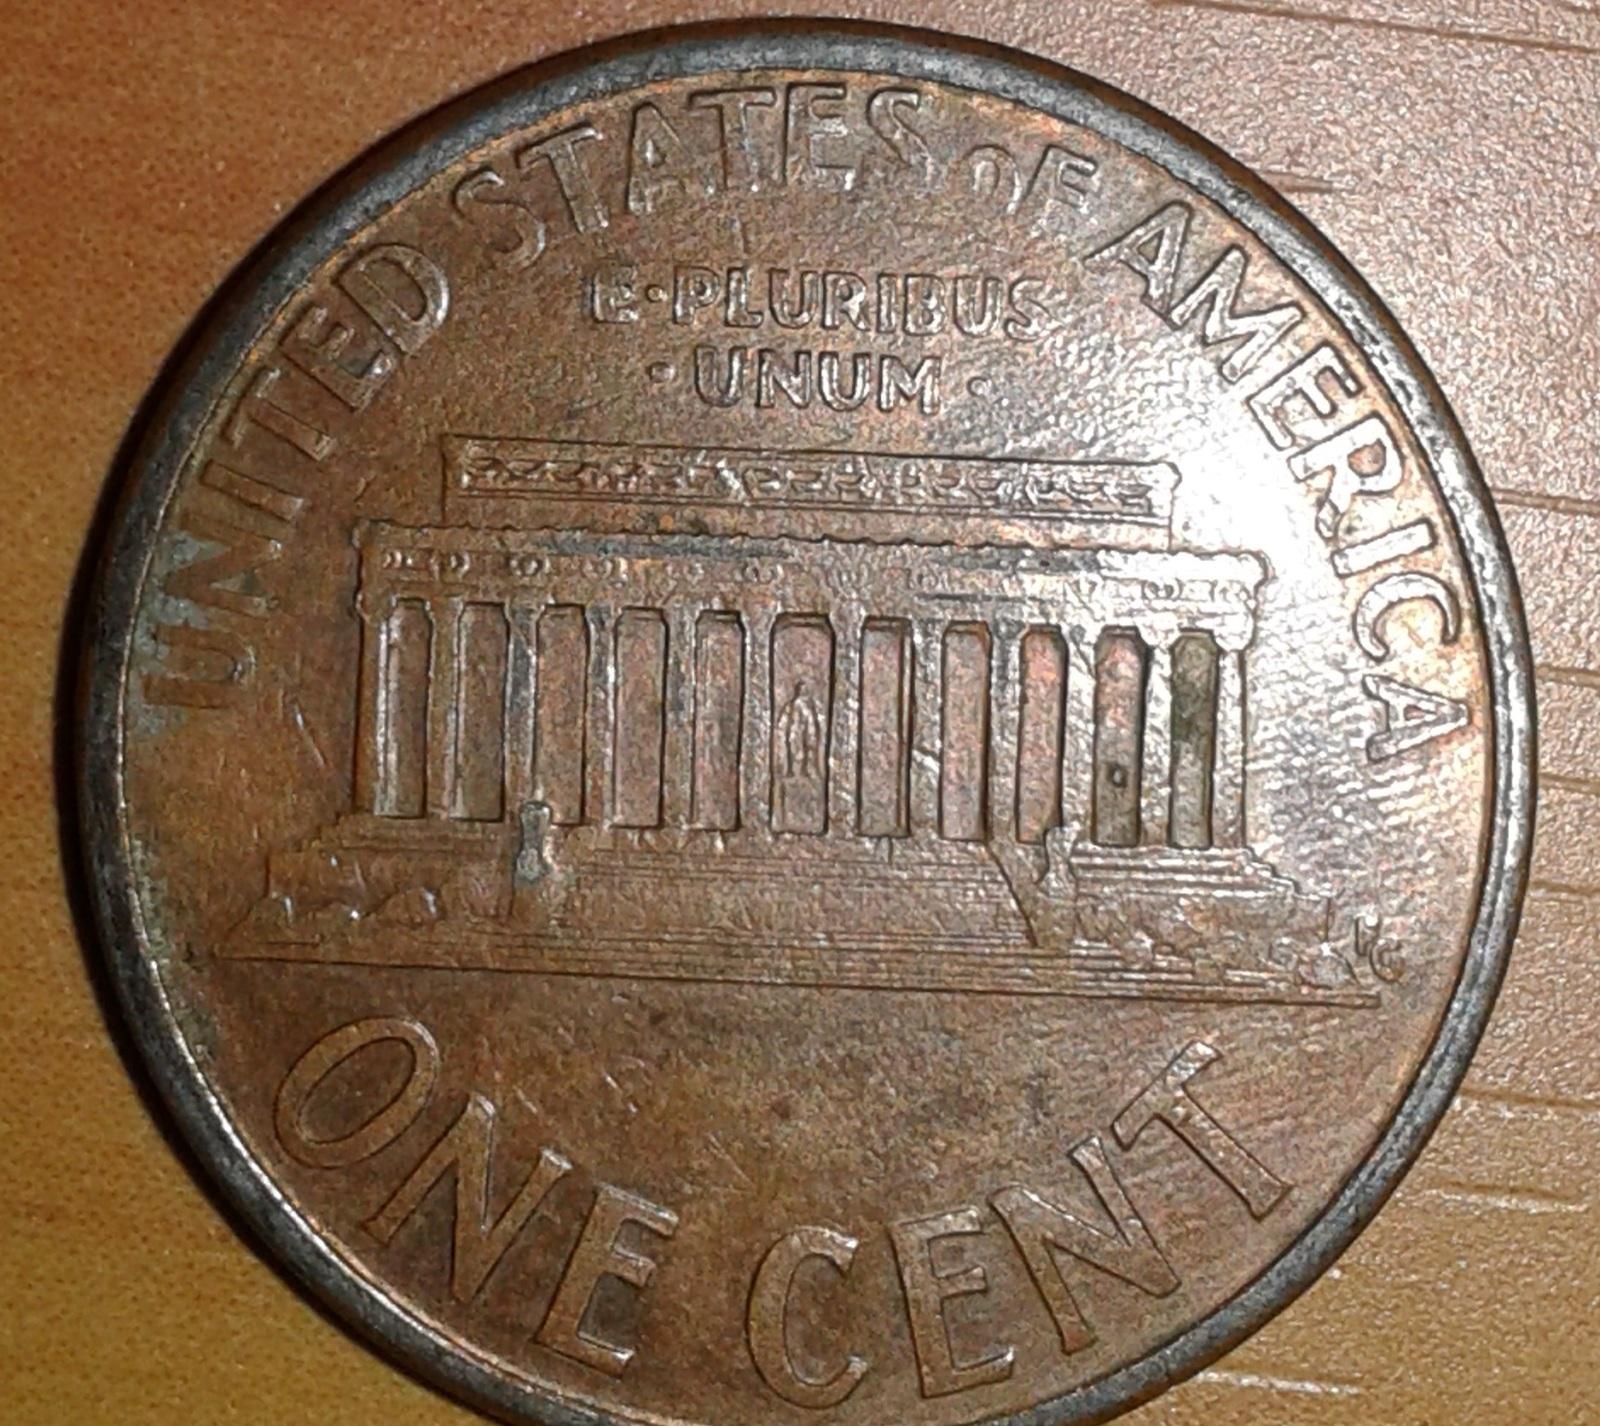 Moneda de un centavo U.S.A. 1996 Dg70i9